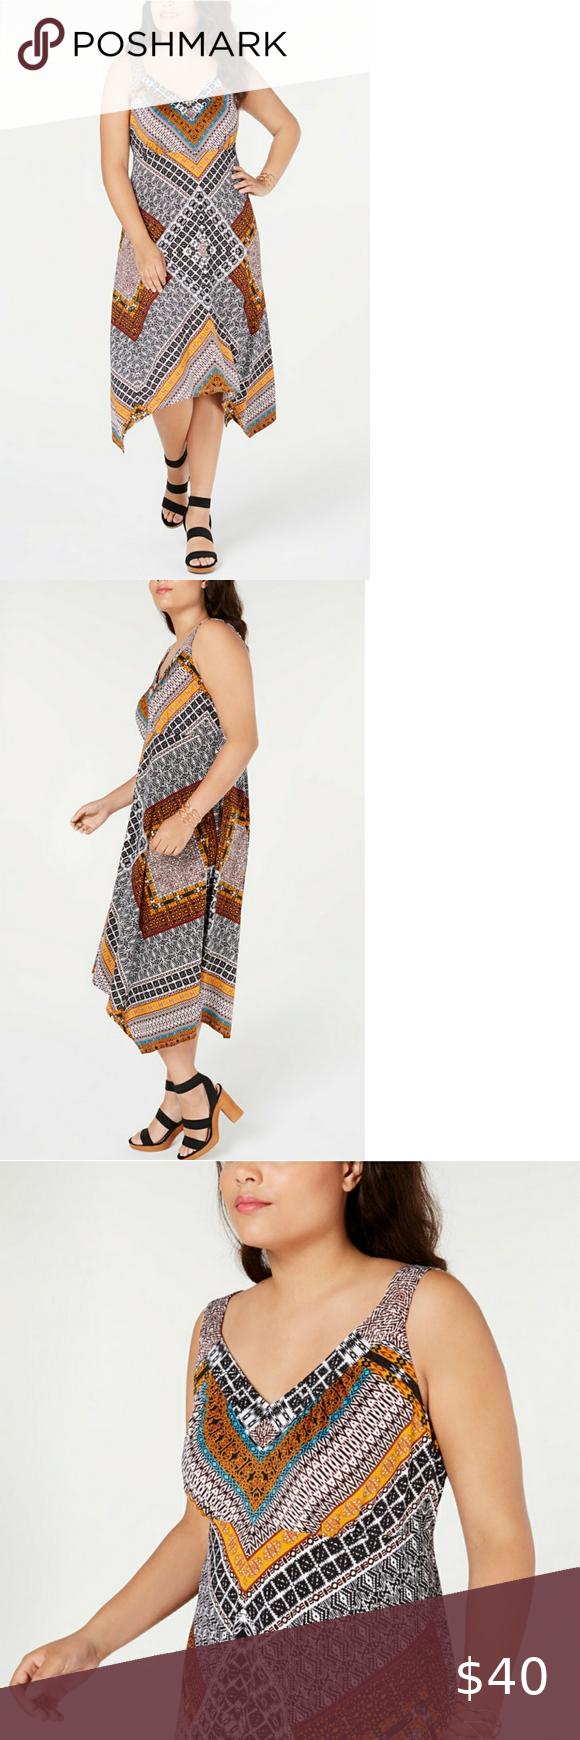 Inc Plus Size 4x Patchwork Handkerchief Maxi Dress Handkerchief Maxi Dress Maxi Dress Pullover Styling [ 1740 x 580 Pixel ]